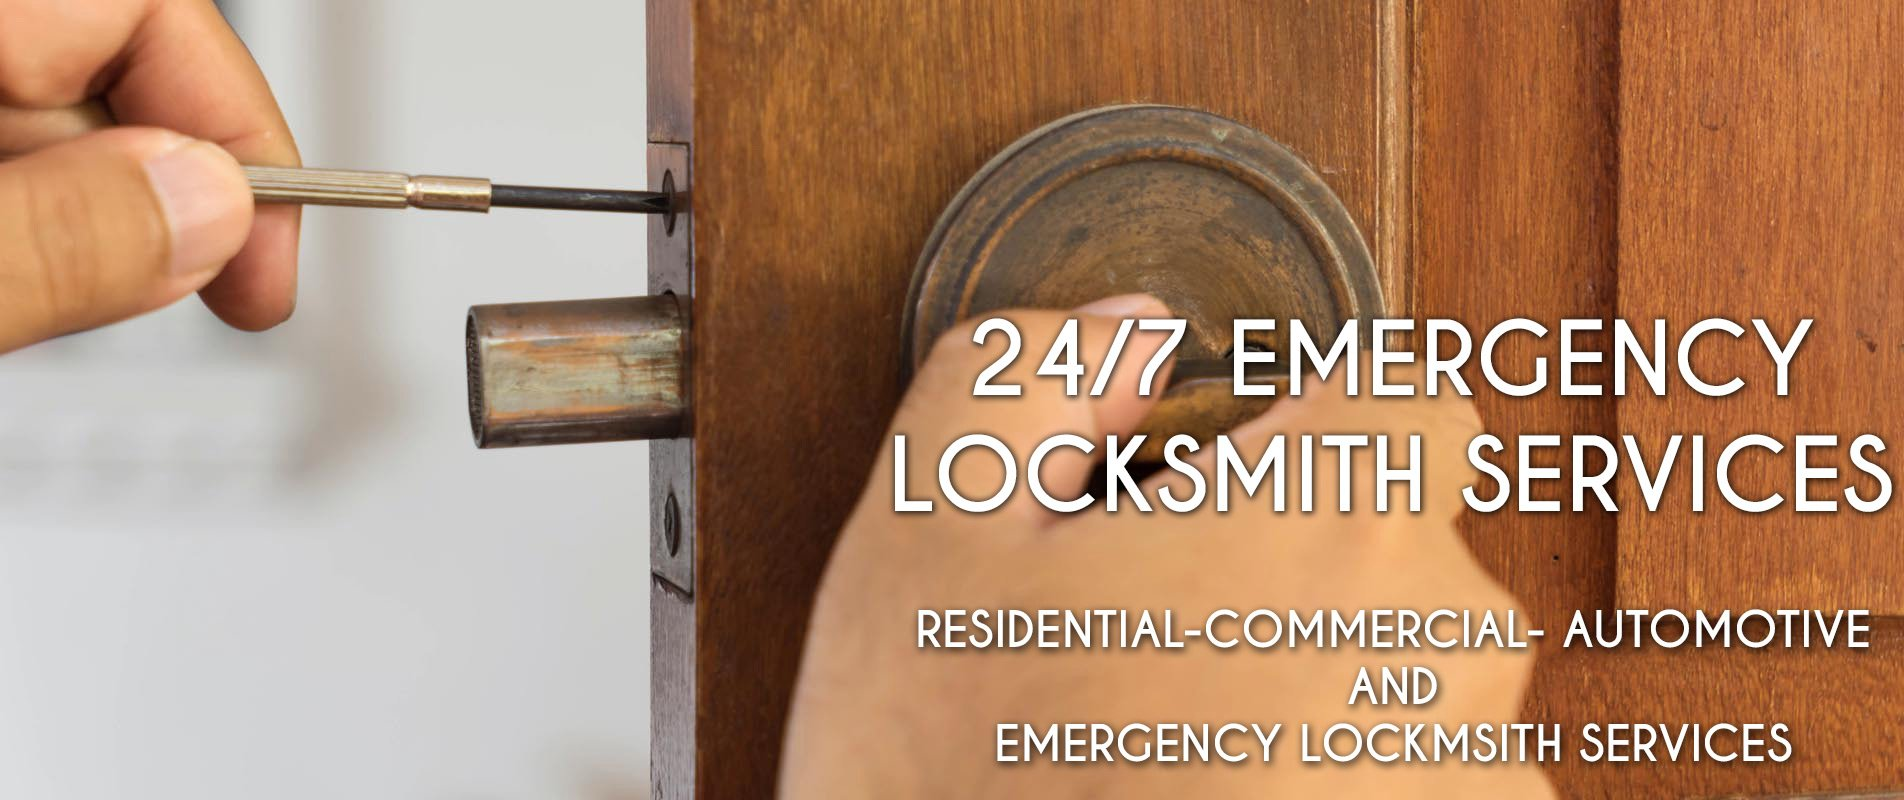 Brice OH Locksmith Store | Cheap Locksmith Near Me in Brice, OH